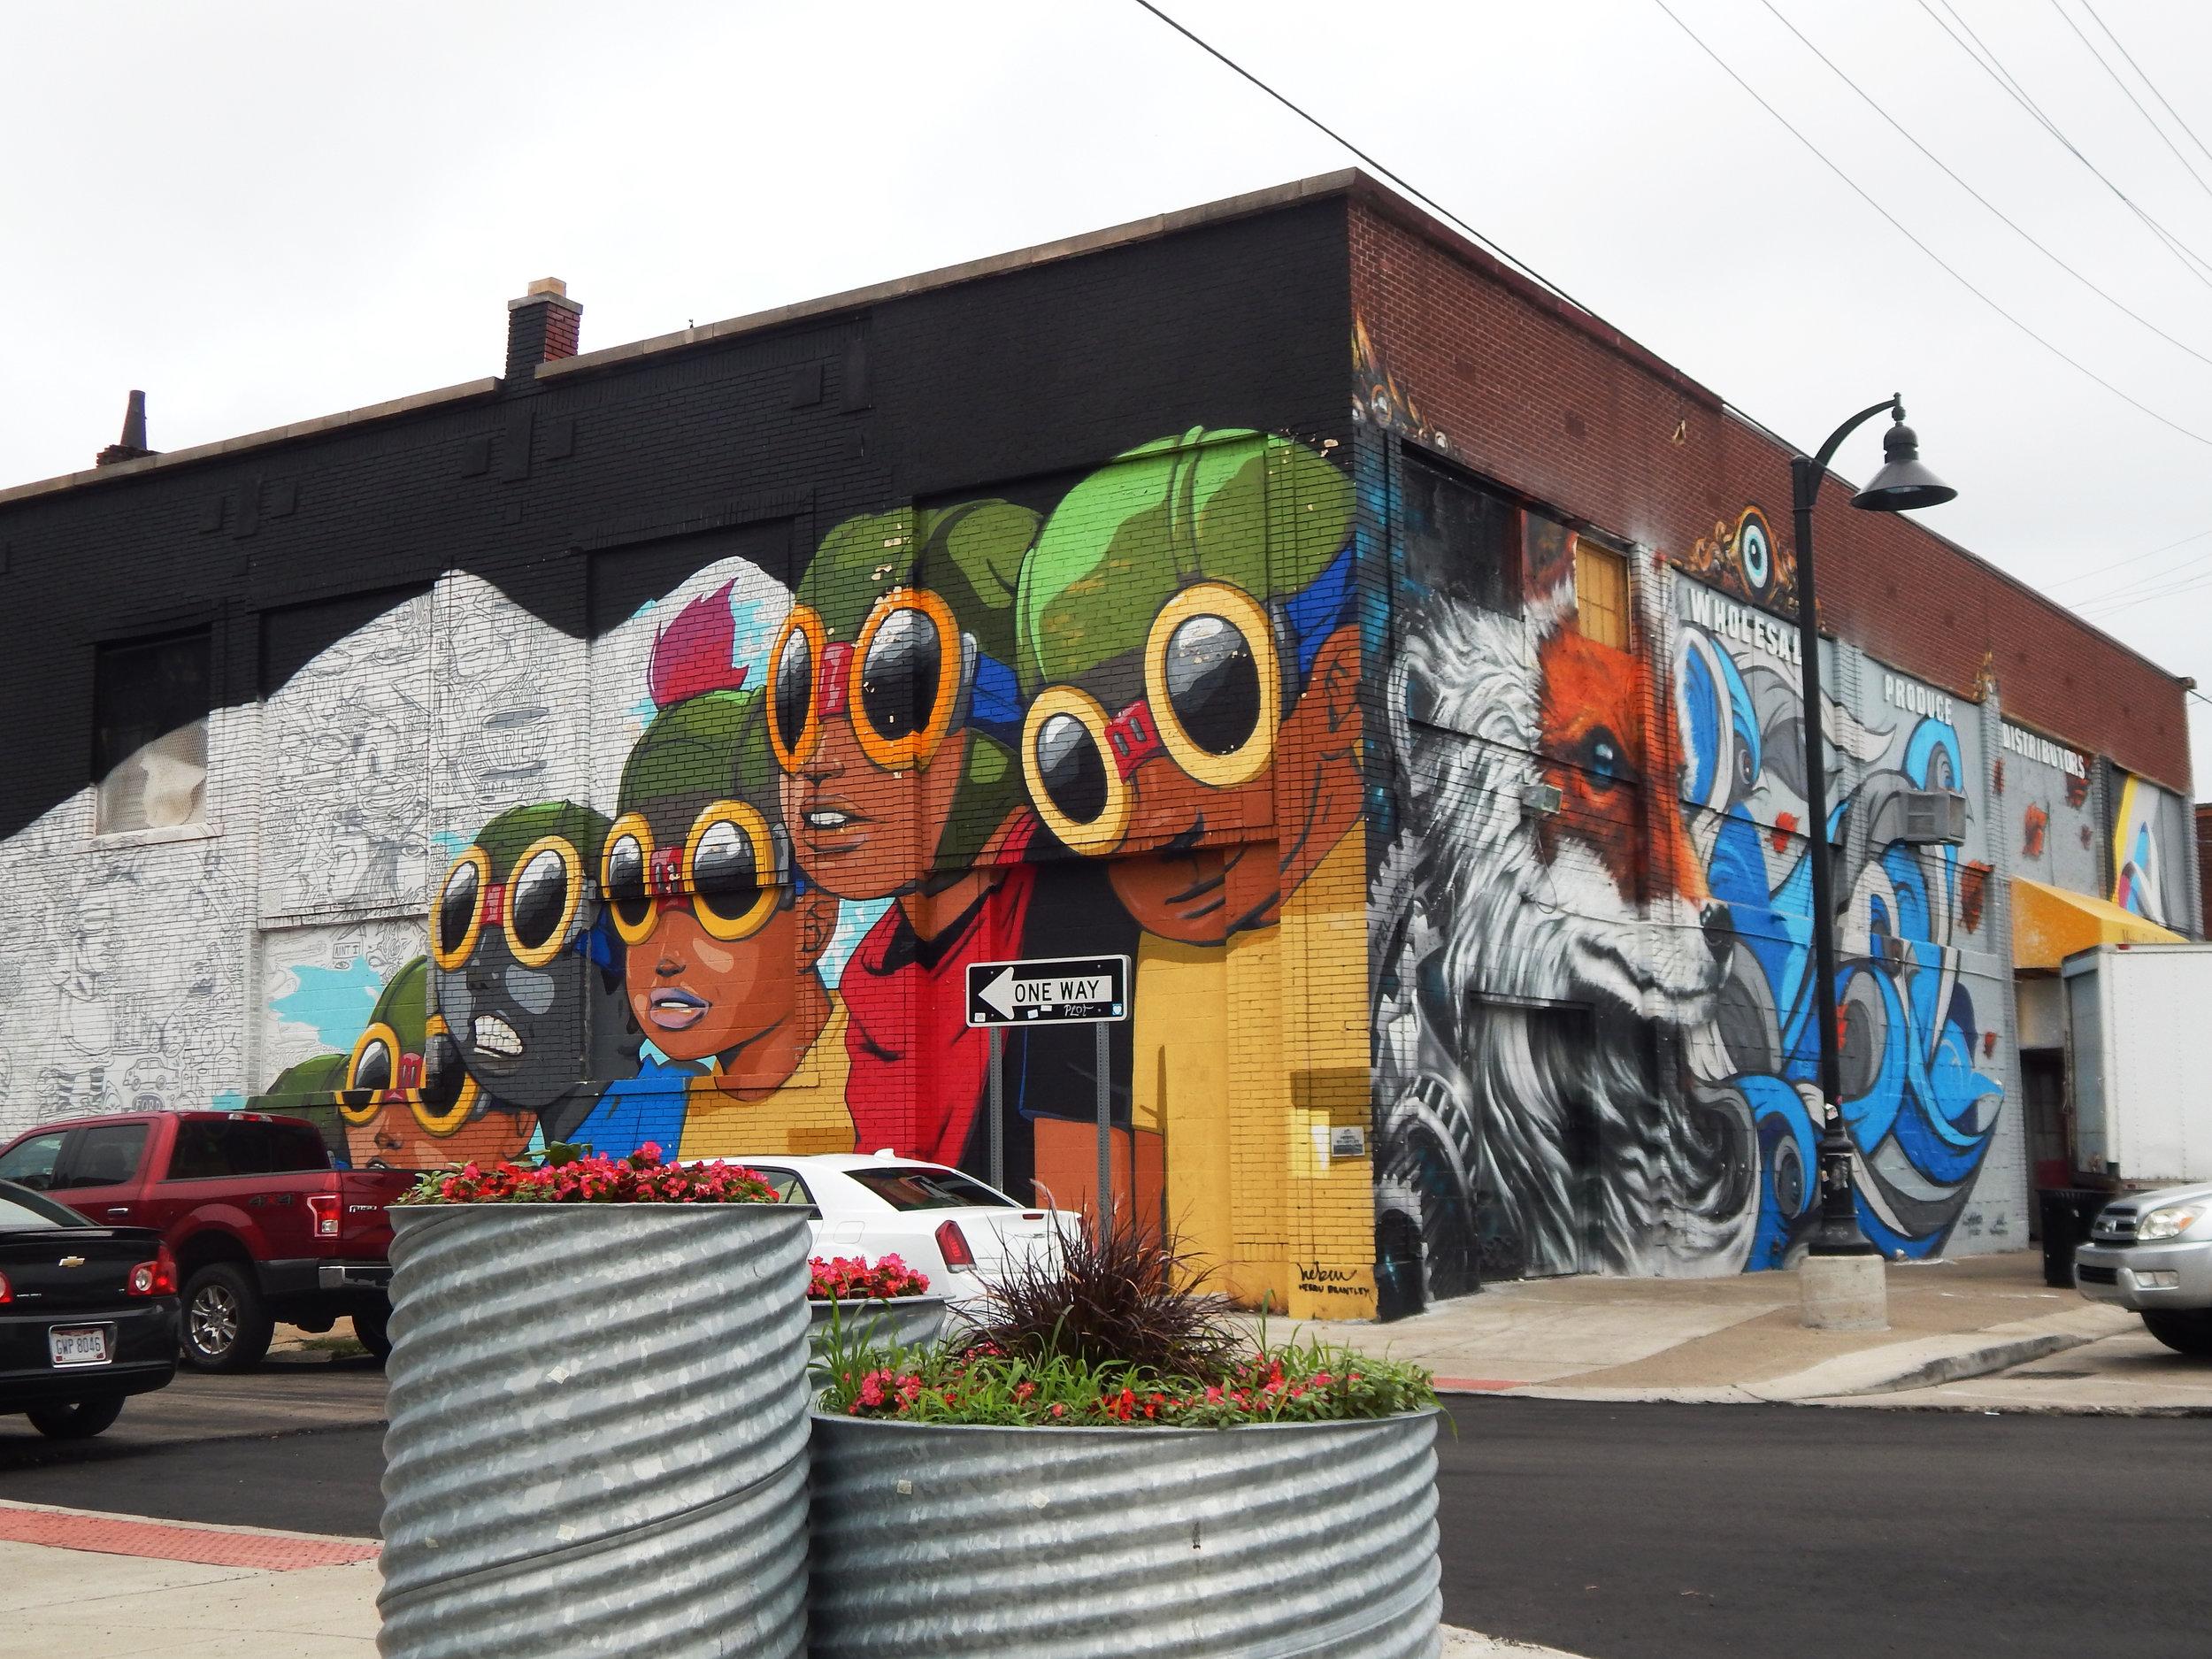 Detroit Public Street Art Mural Graffiti Murals in the Market